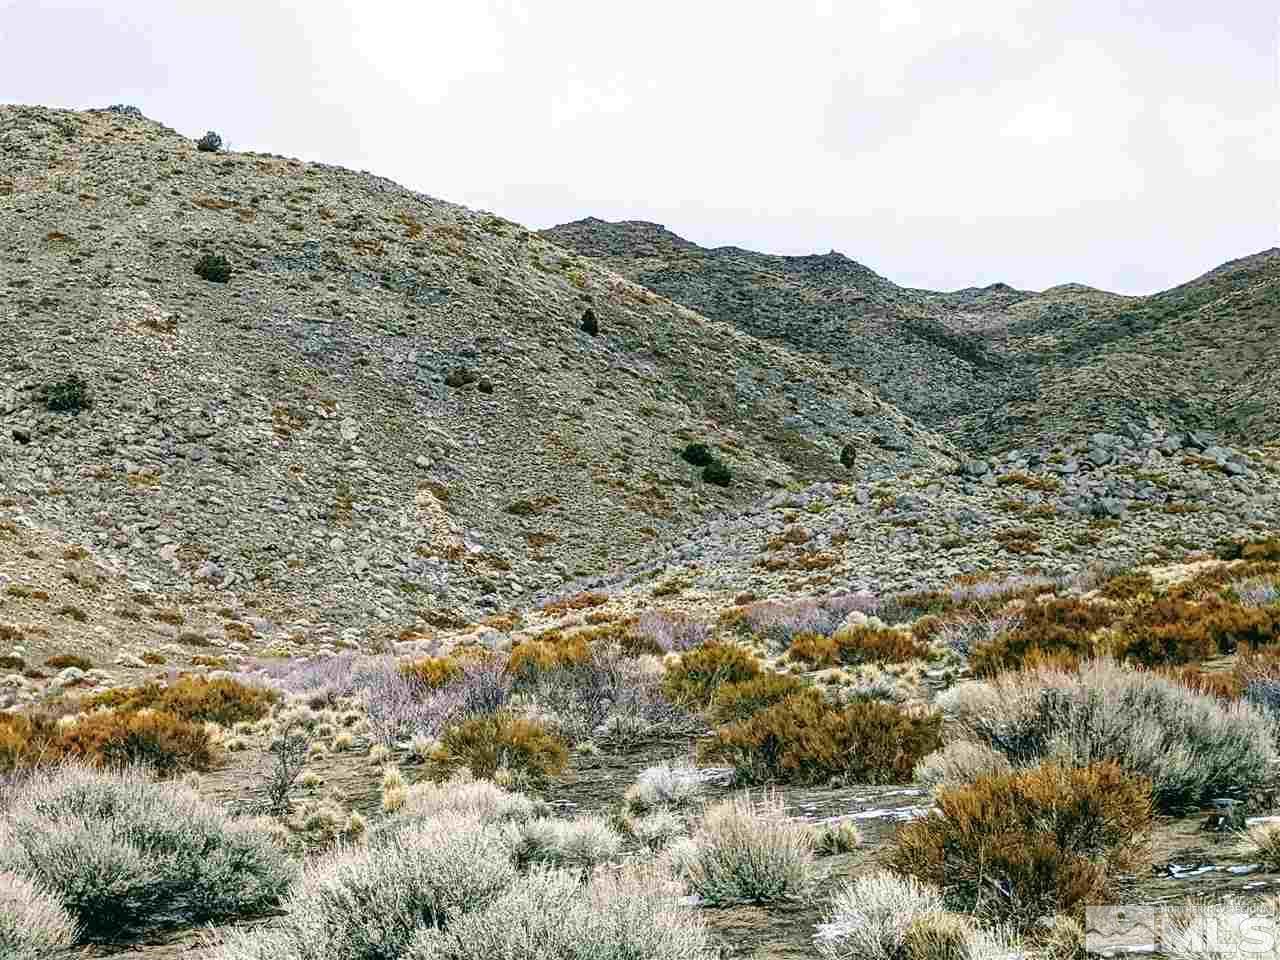 Image for 1305 Freds Mountain, Reno, NV 89508